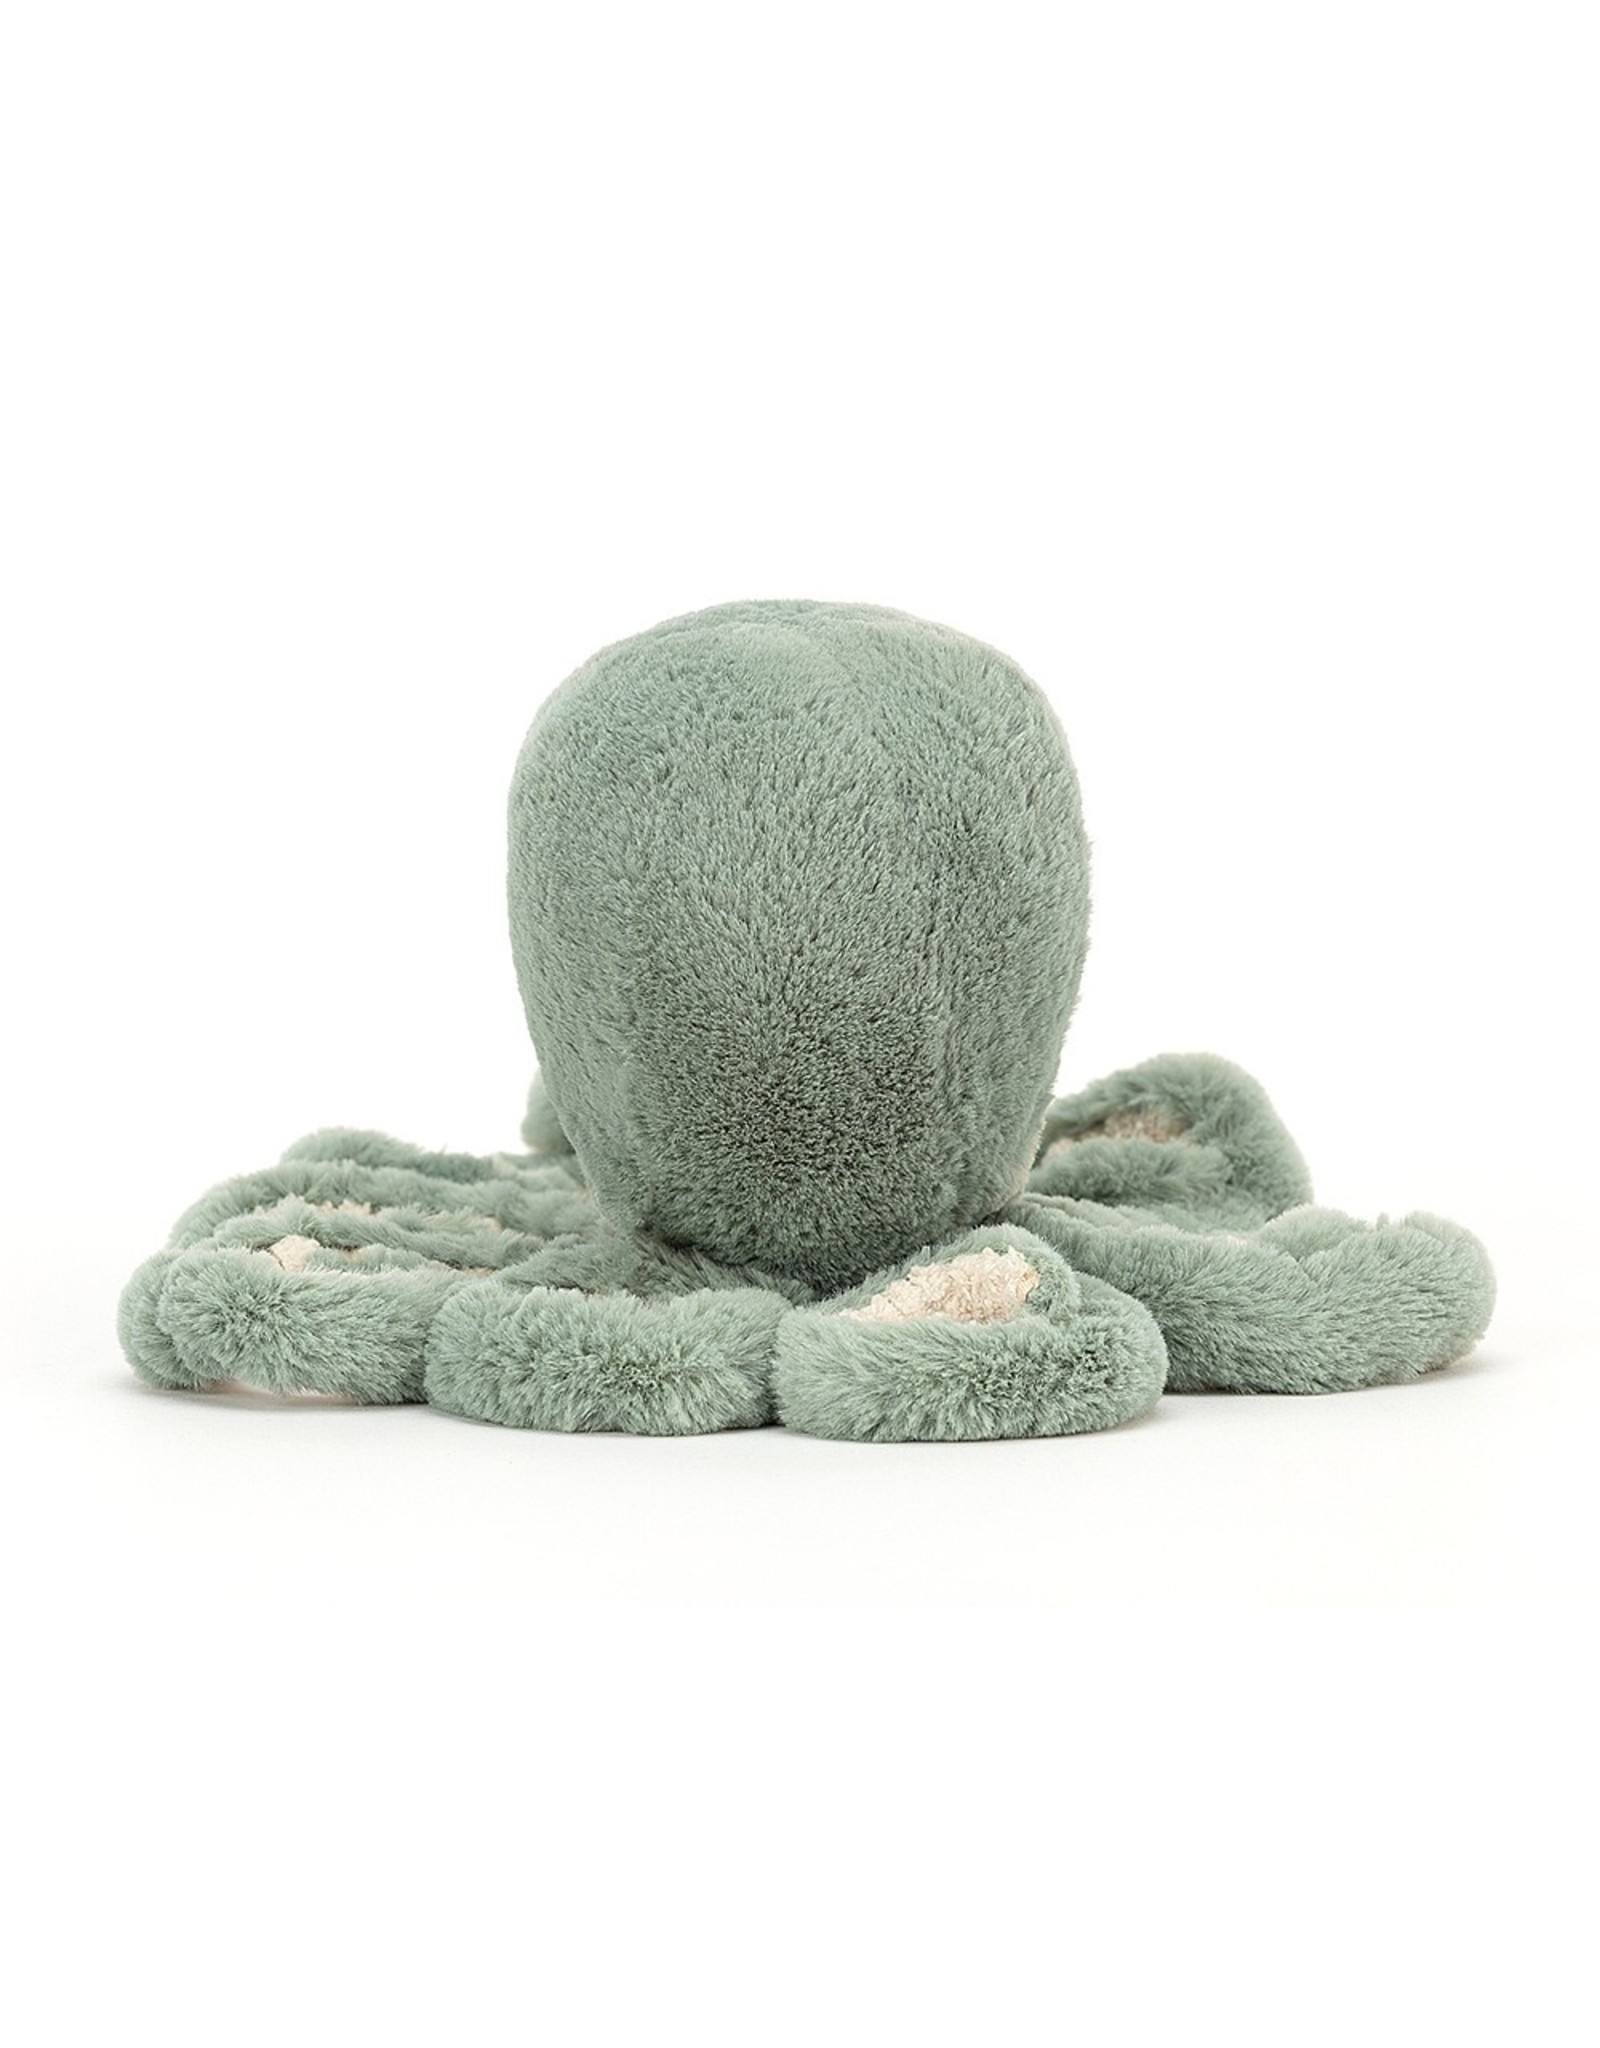 Jellycat Odyssey -  Octopus Small